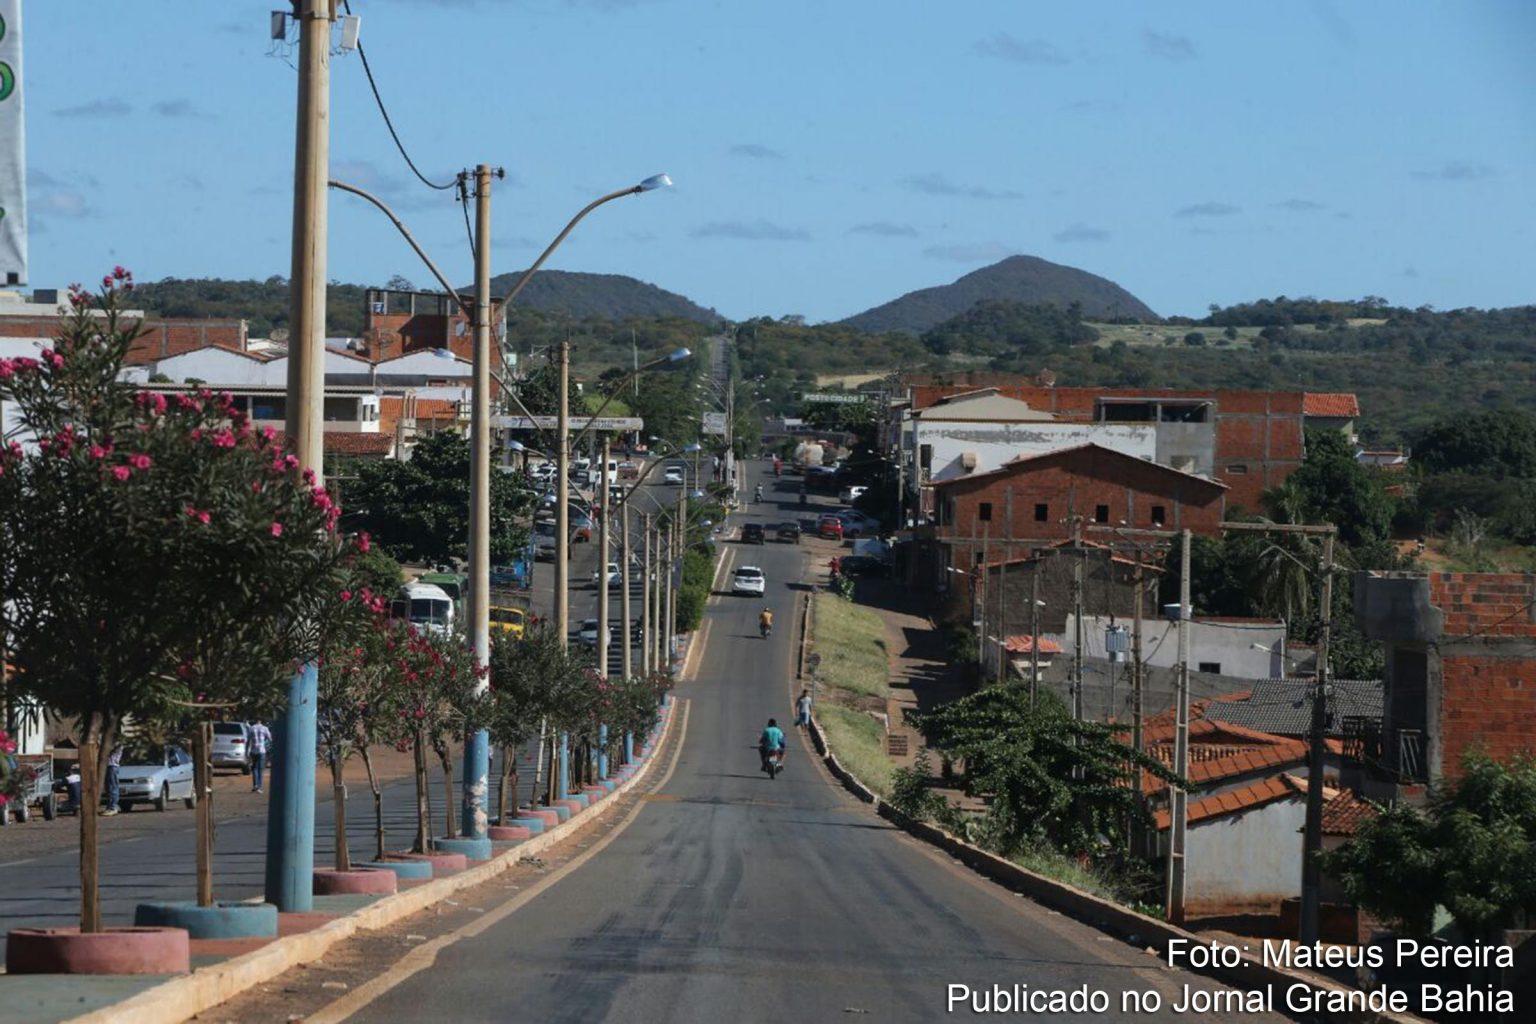 Vista da cidade de Riacho de Santana